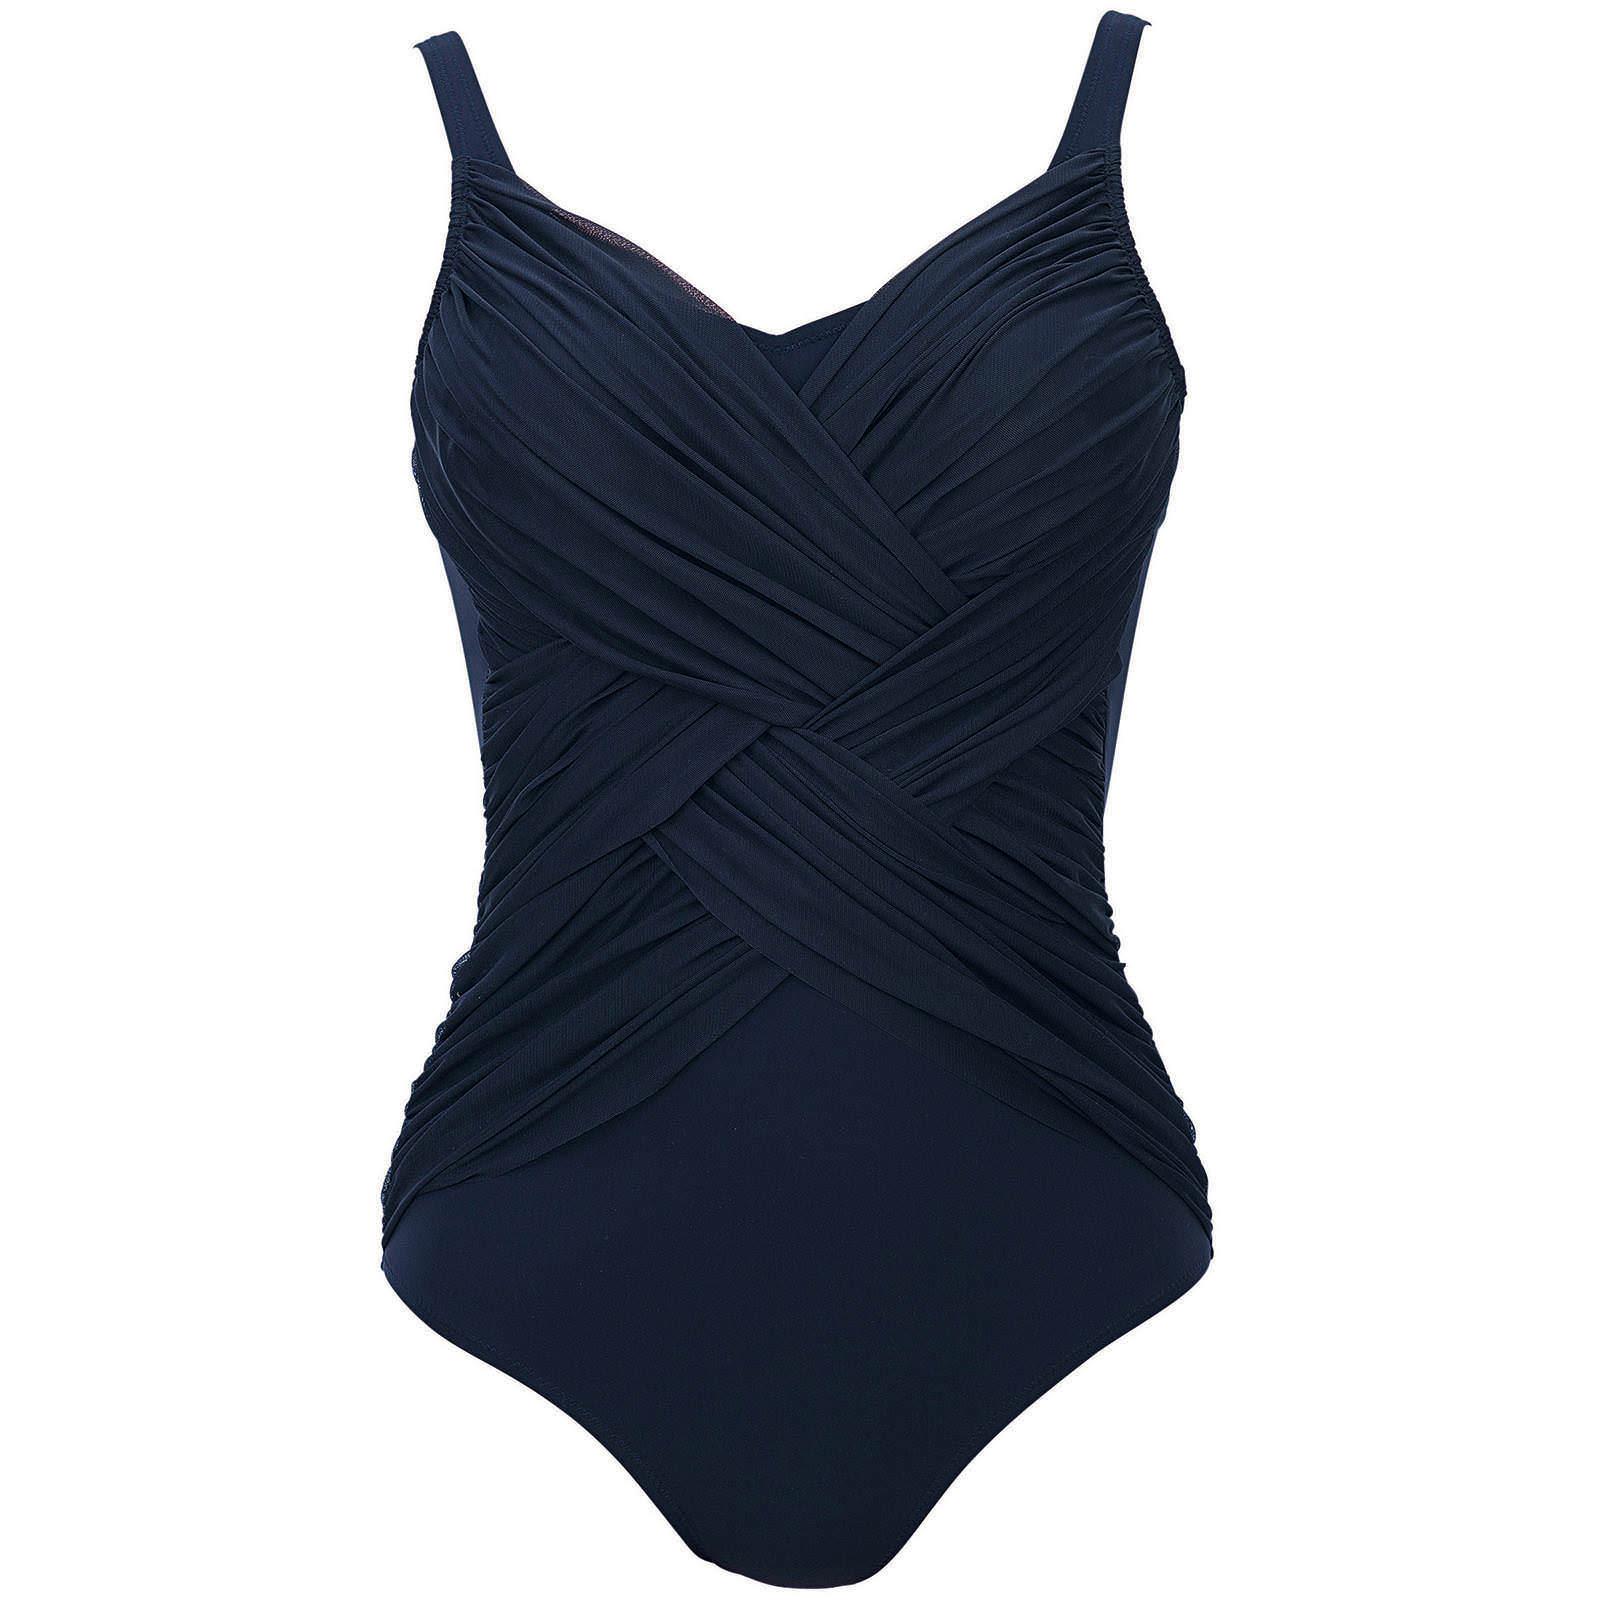 maillot de bain tropical passion in bleu fonc bademode badeanz ge schultertr ger. Black Bedroom Furniture Sets. Home Design Ideas